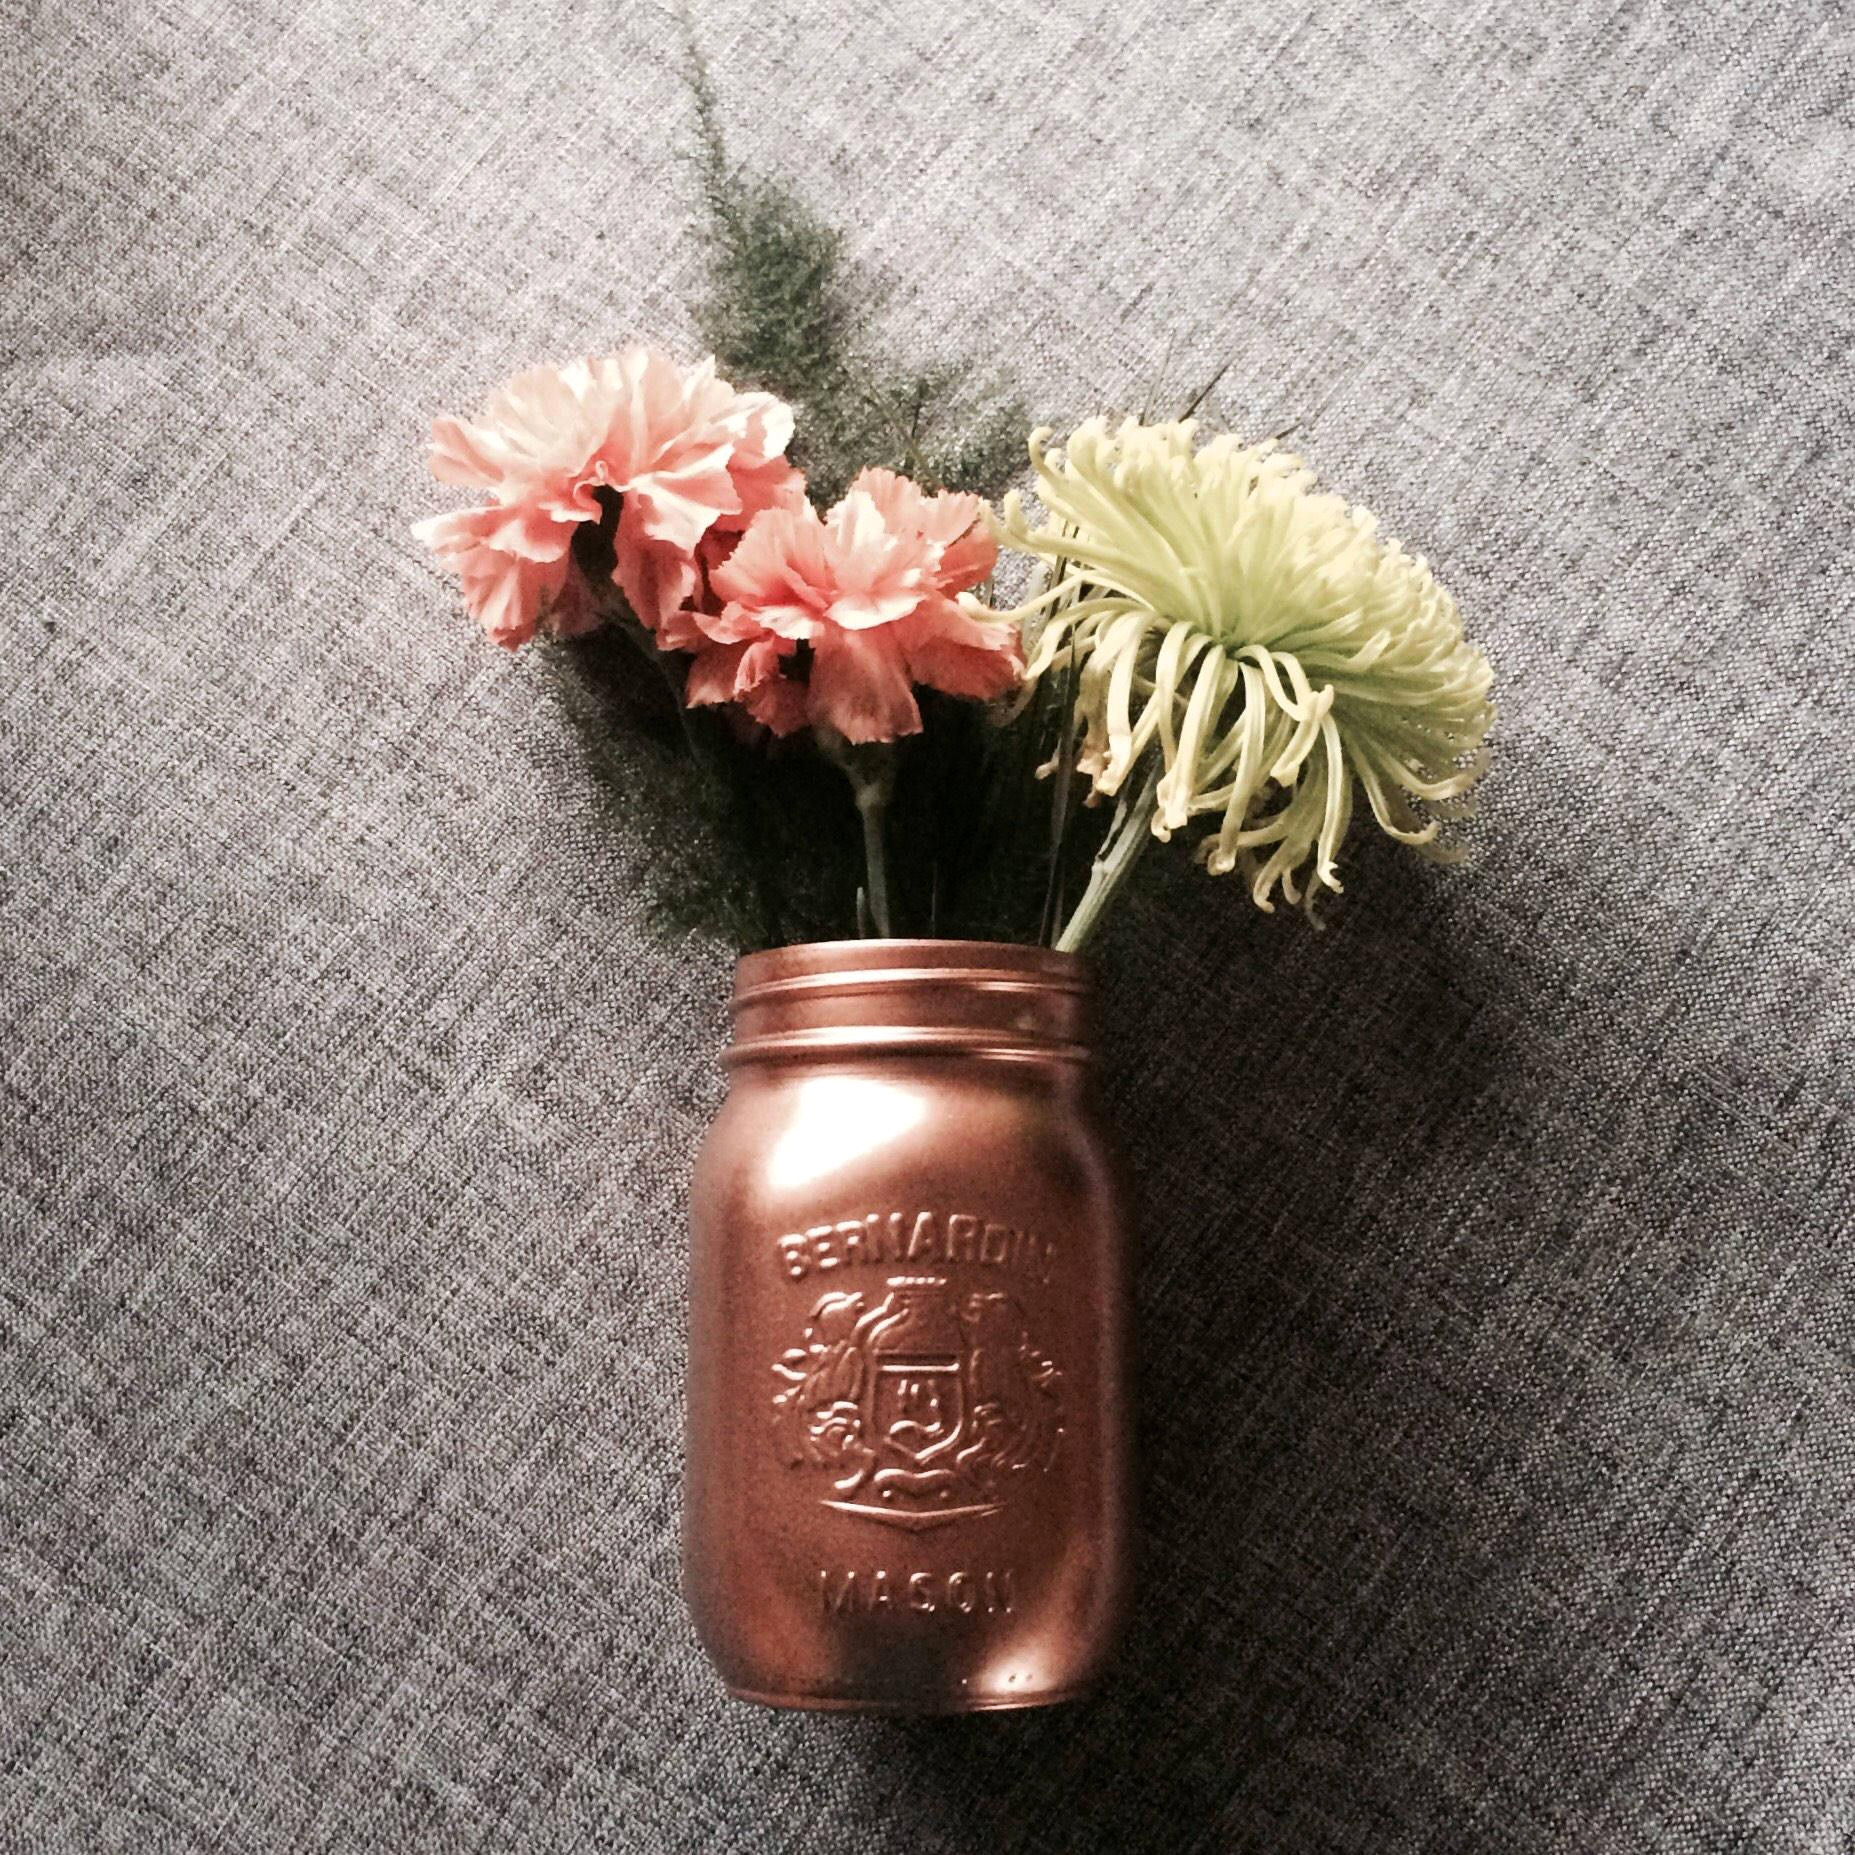 pink vase filler of winter wedding decorations best of living room vases wedding luxury regarding mason jar wedding decorations fresh living room vases wedding inspirational h vases candy vase i 0d